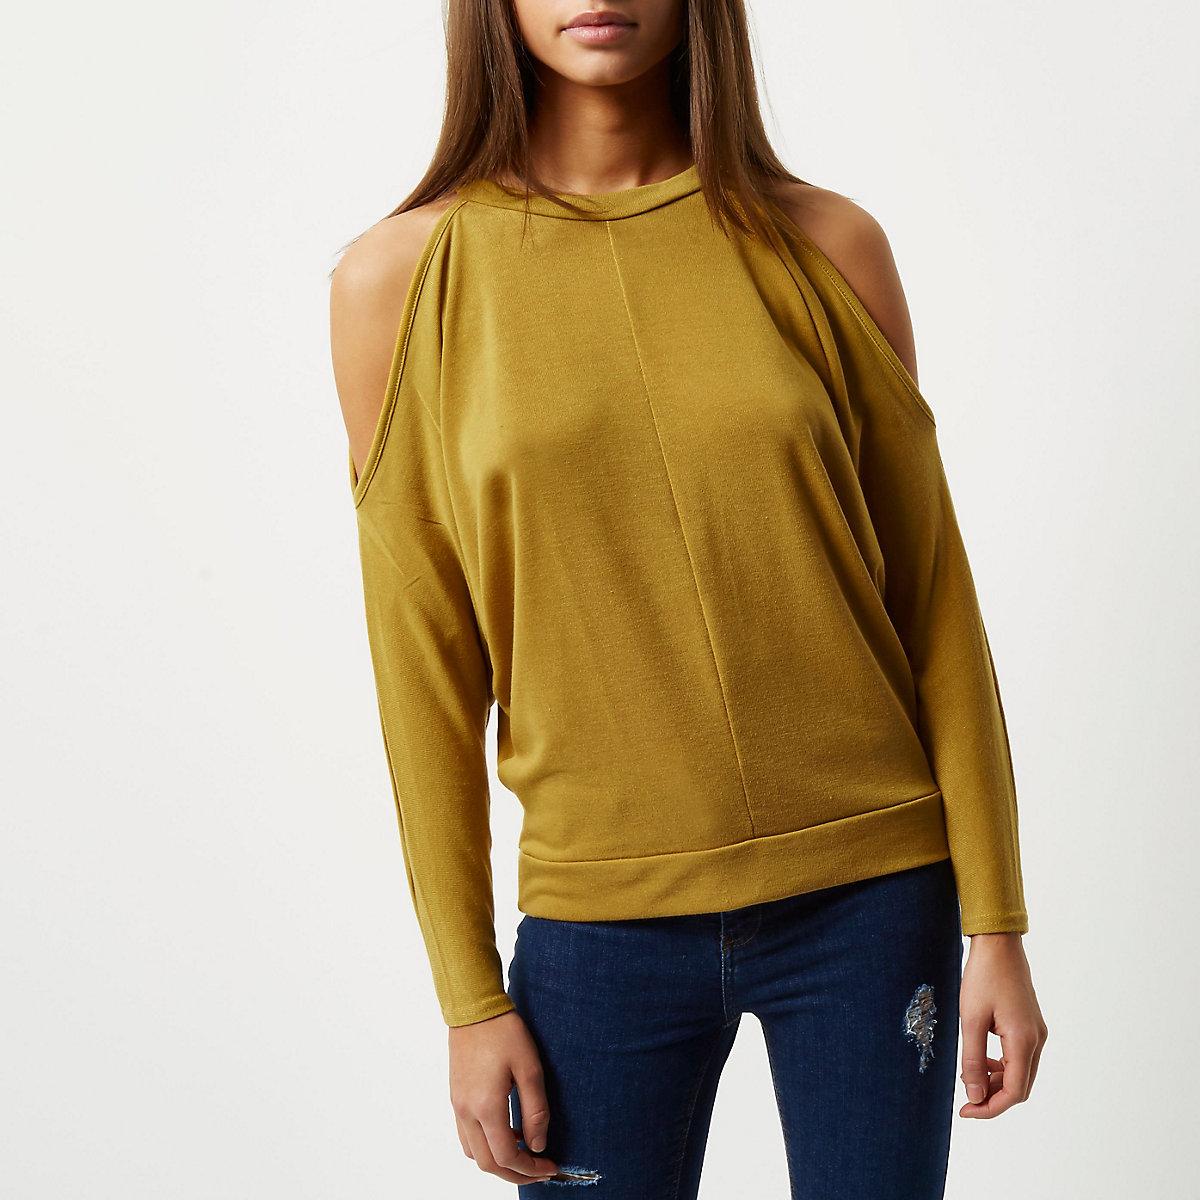 01d18abbc2ce71 Dark yellow cold shoulder batwing top - Knit Tops - Knitwear - women